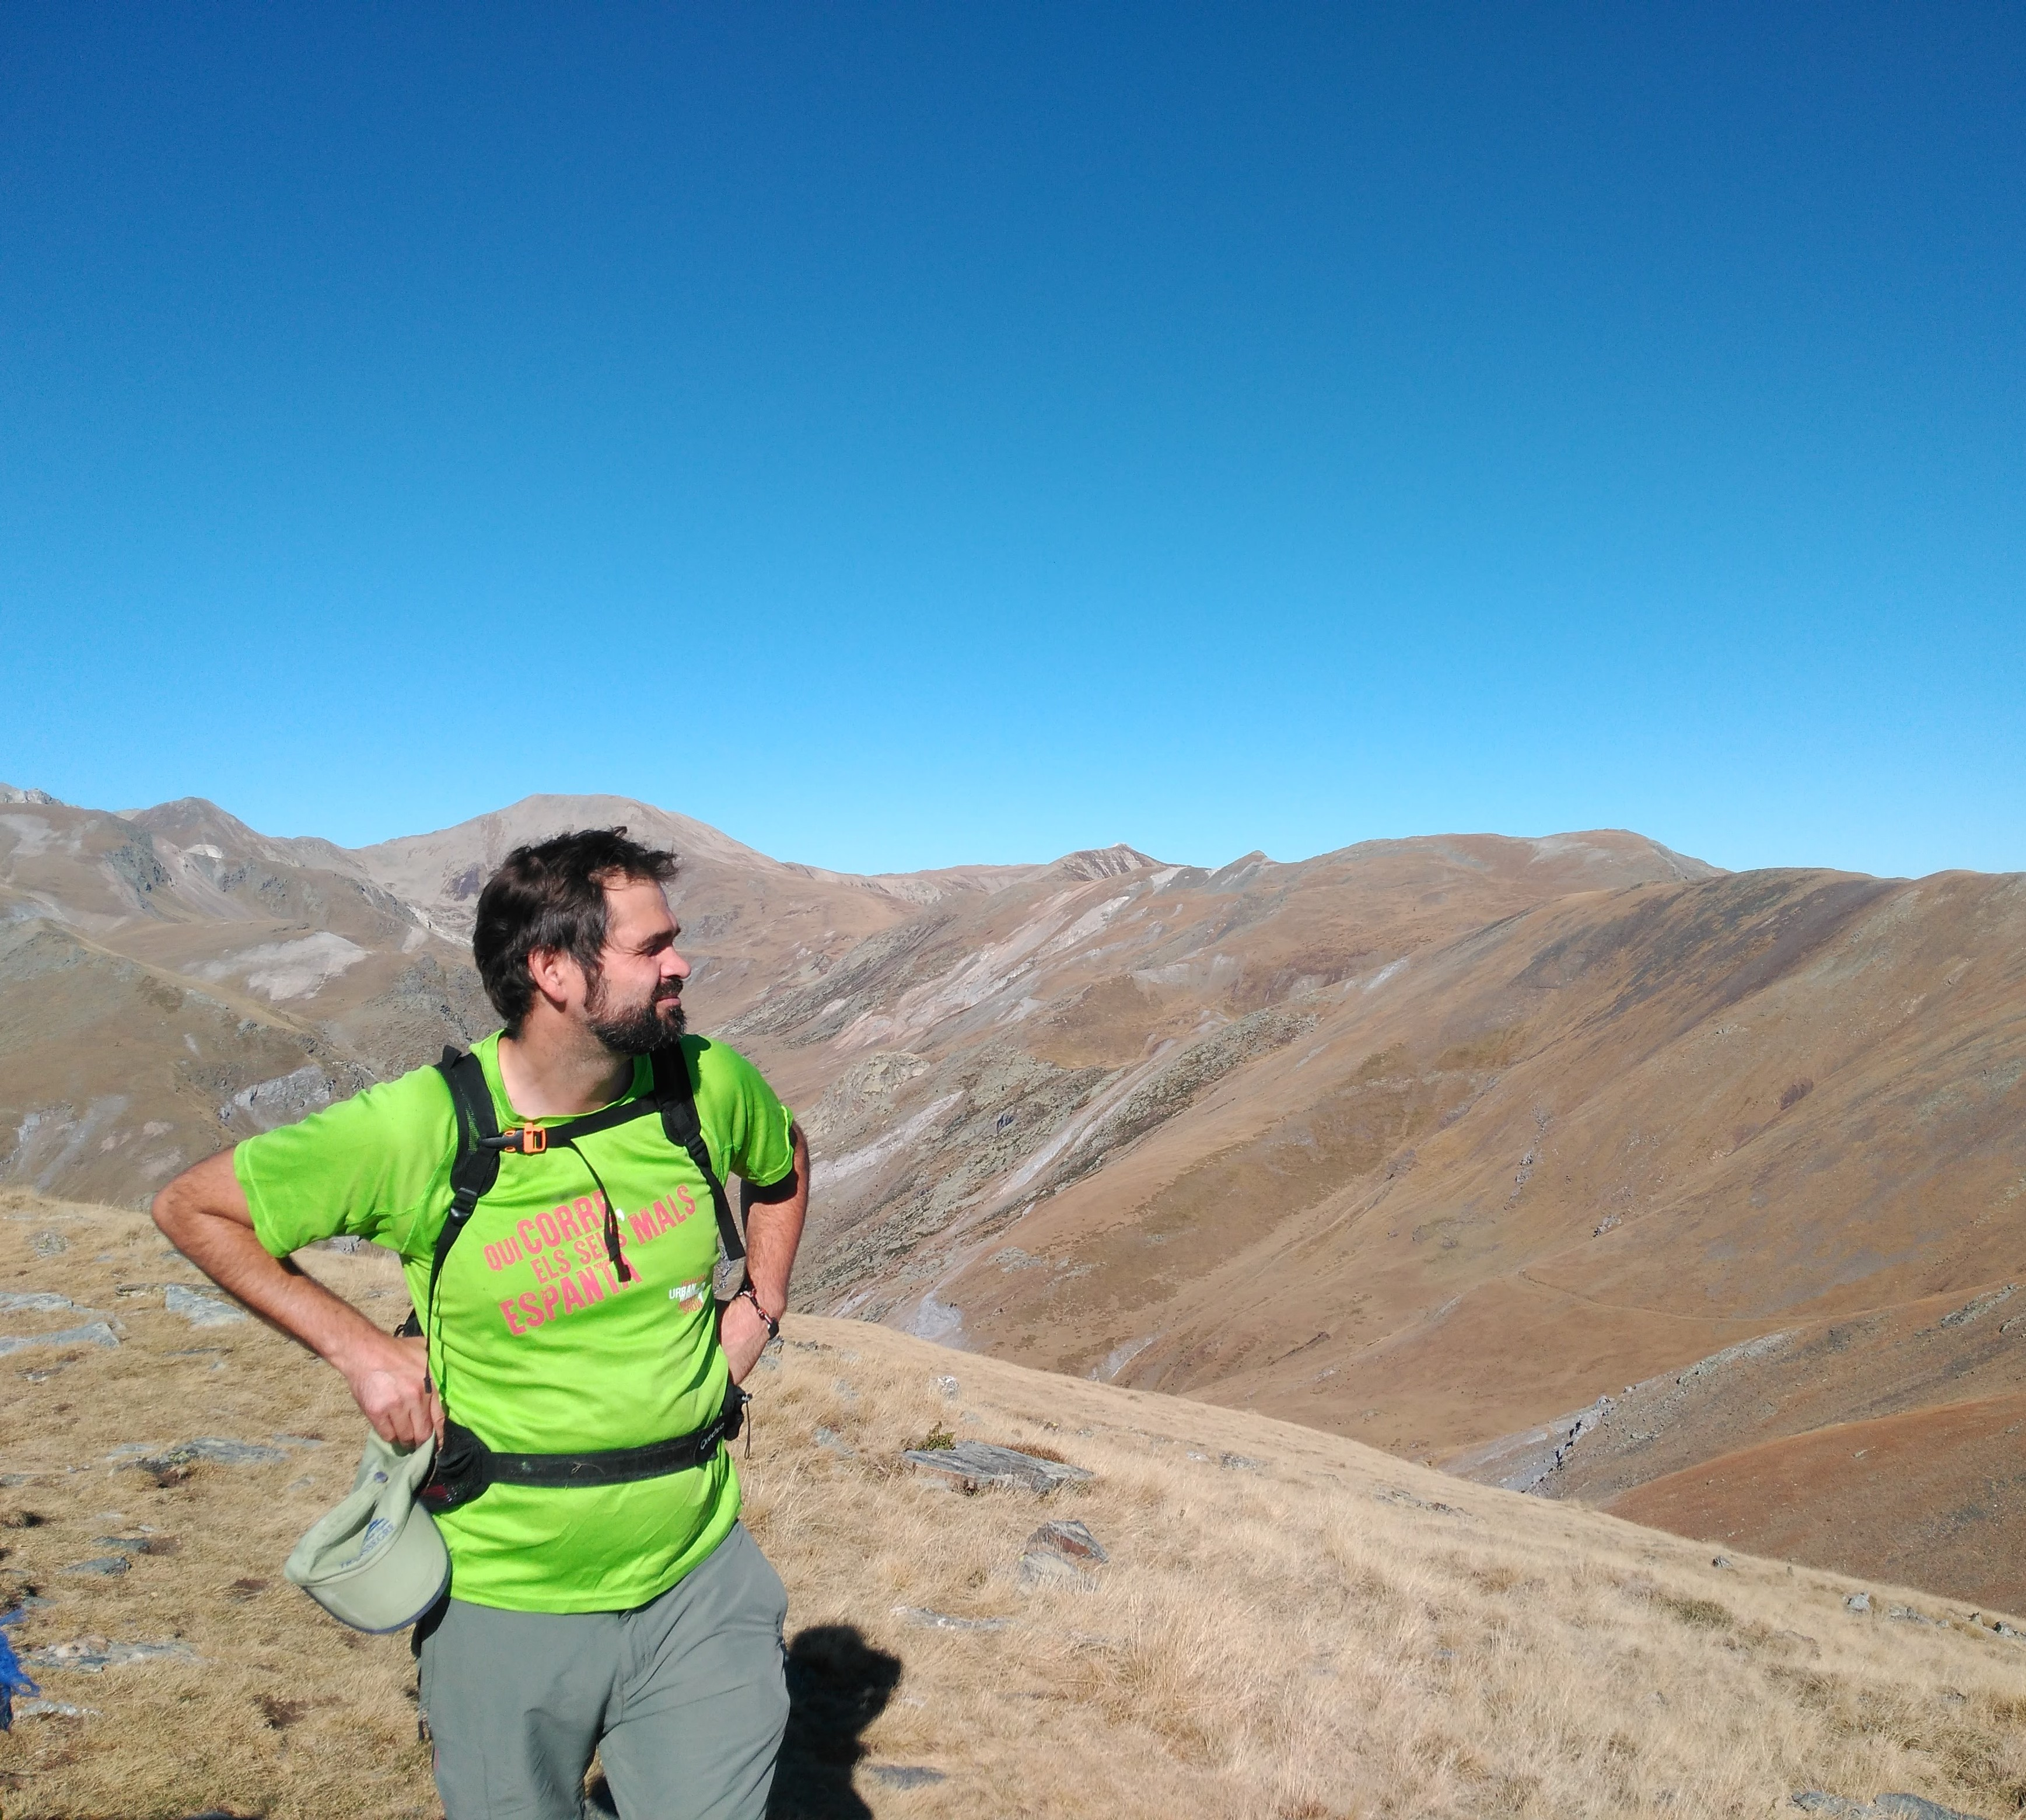 Viajar con autonomia con LikeCamper